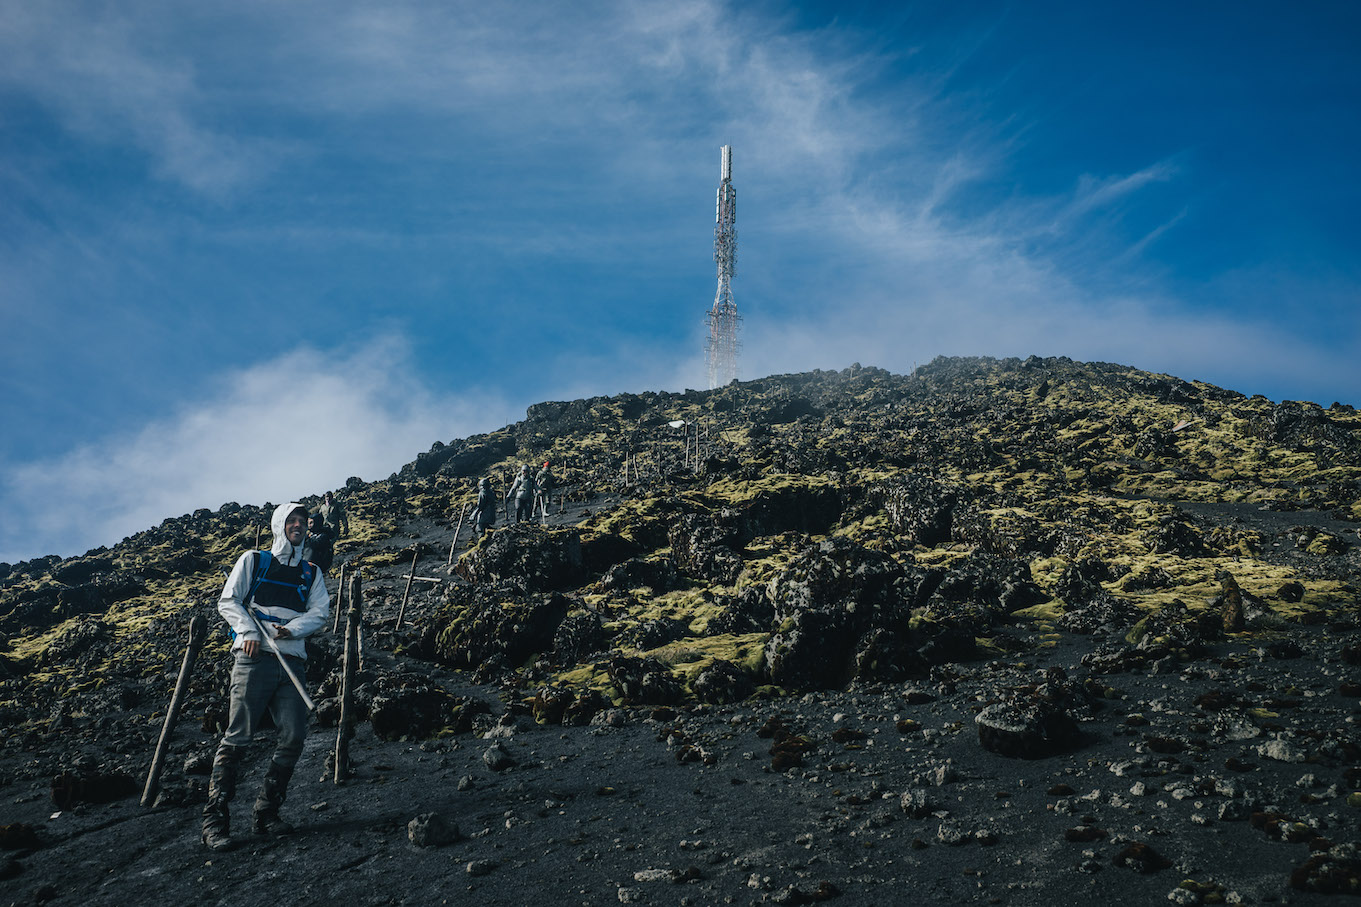 L'antenne au sommet du volcan Karisimbi au Rwanda.